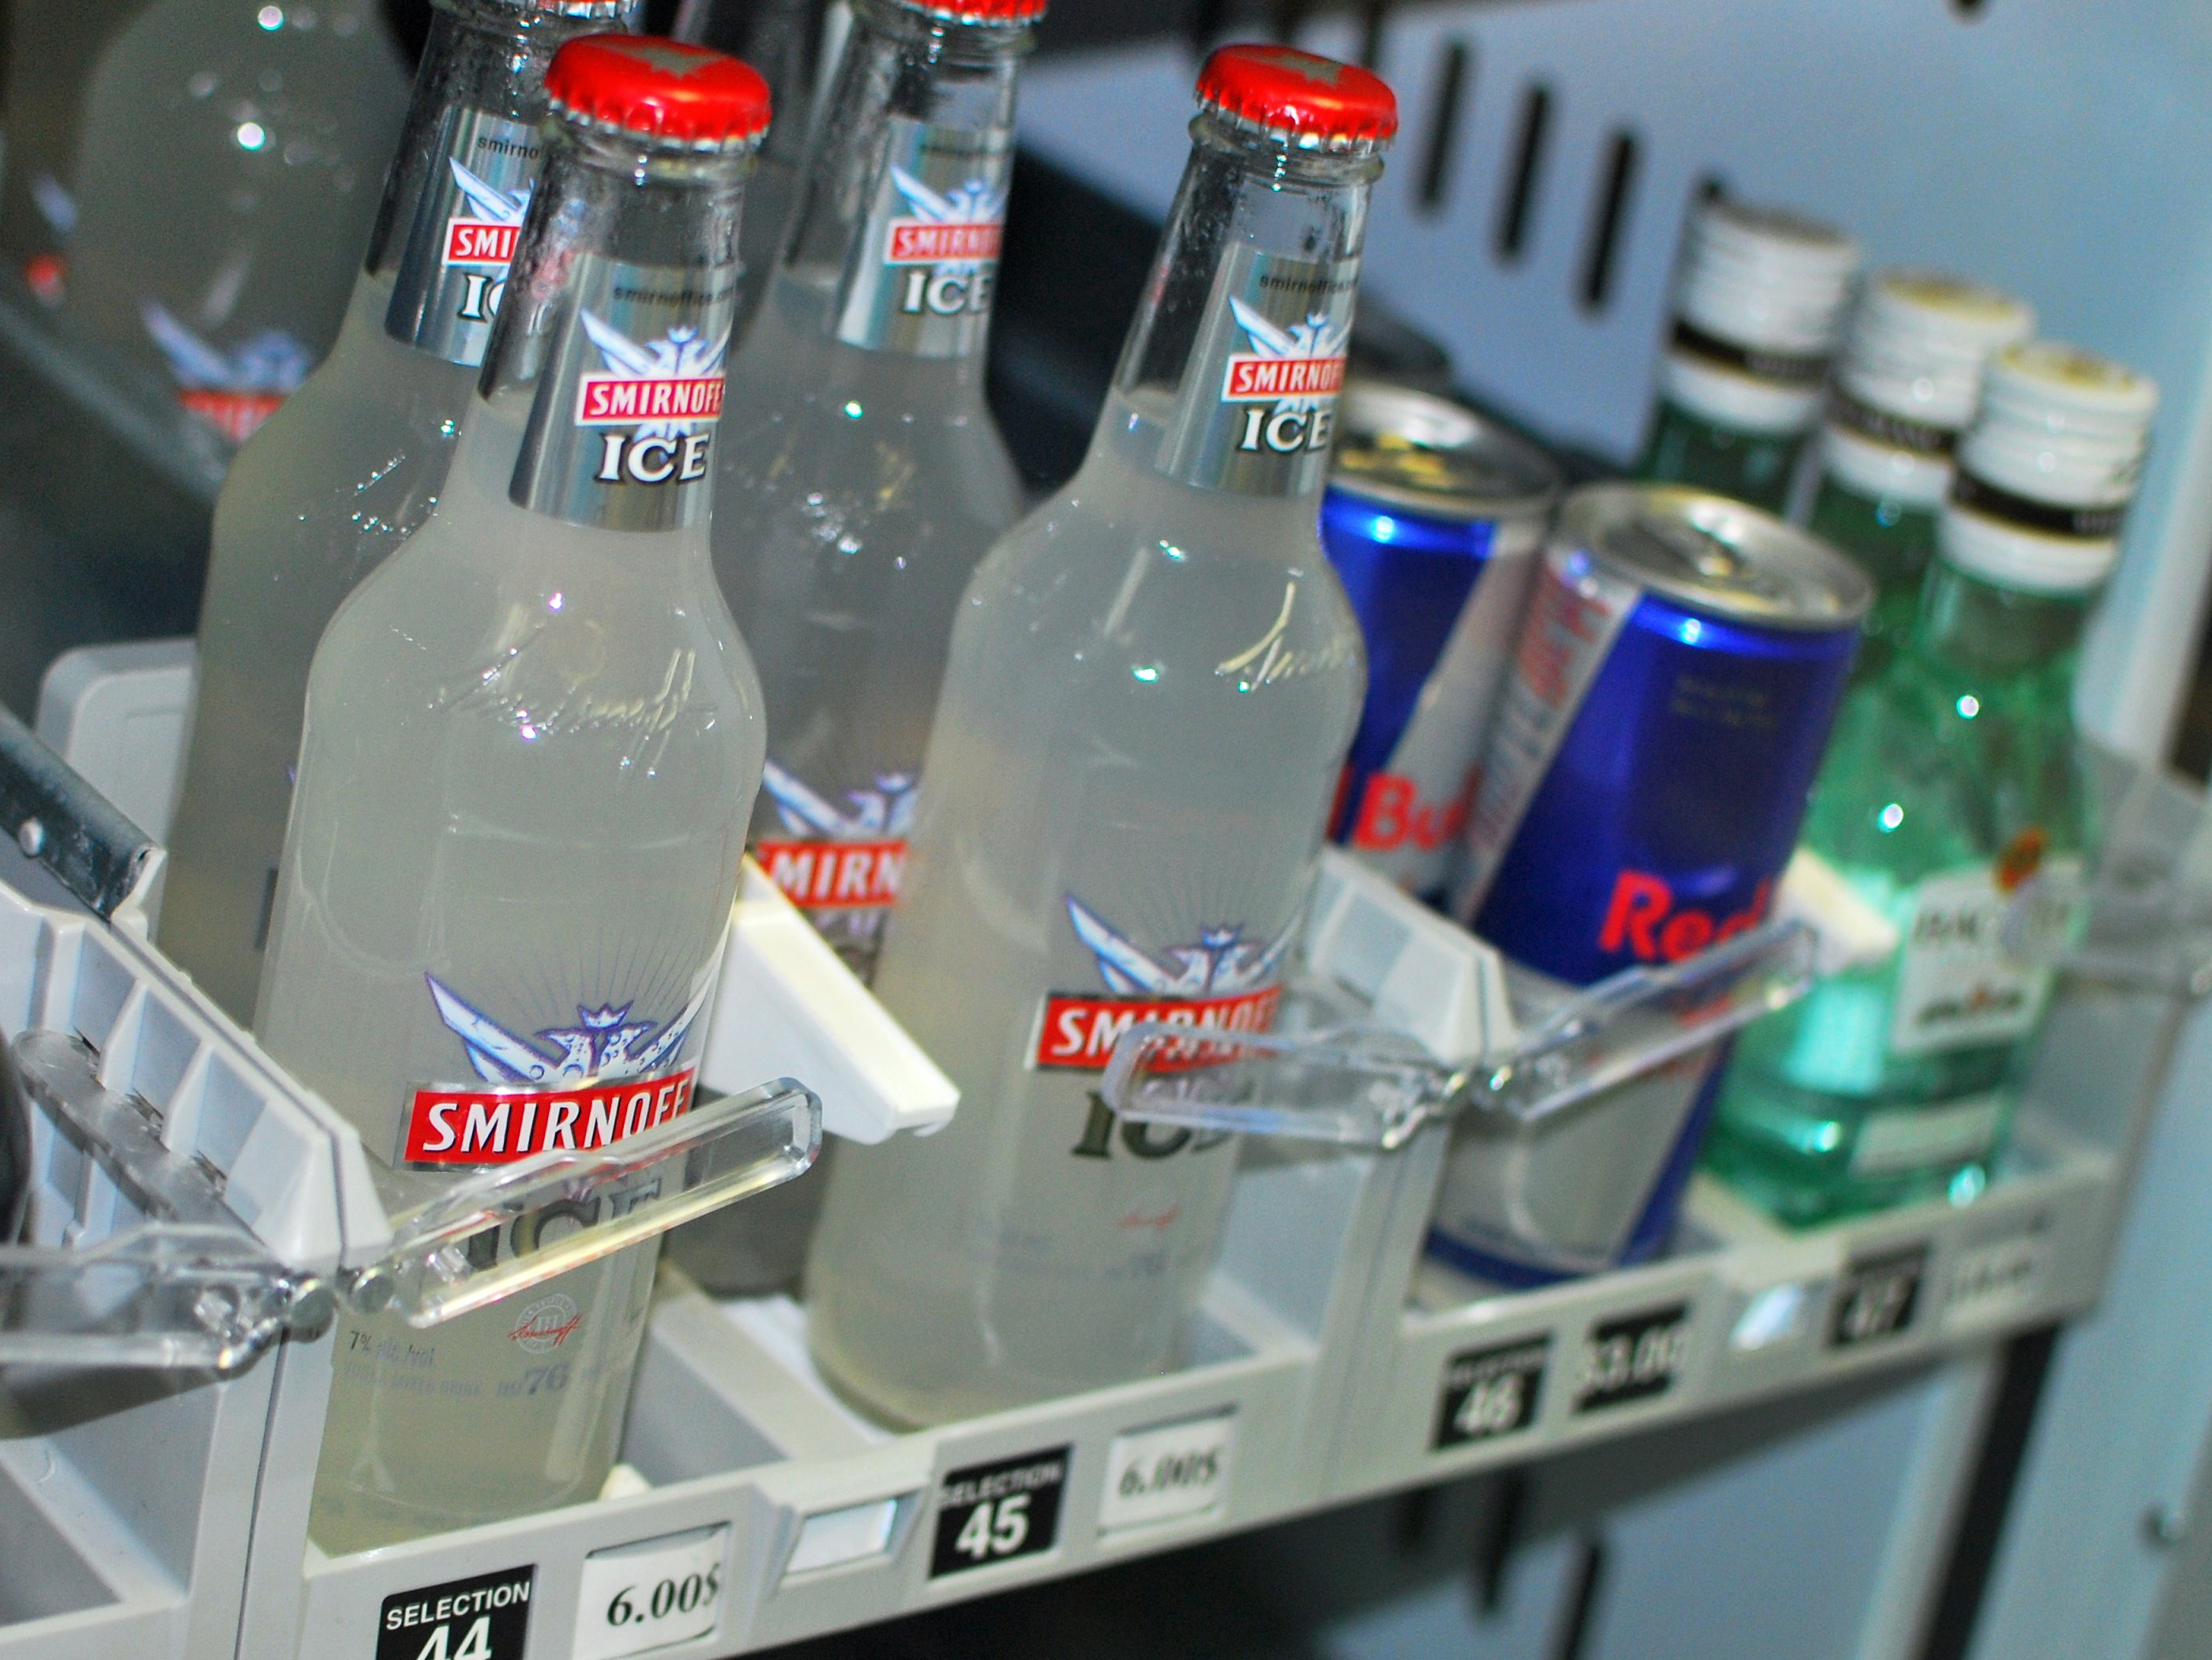 Smirnoff Ice malt beverages in sweet fruity flavors are popular among ...